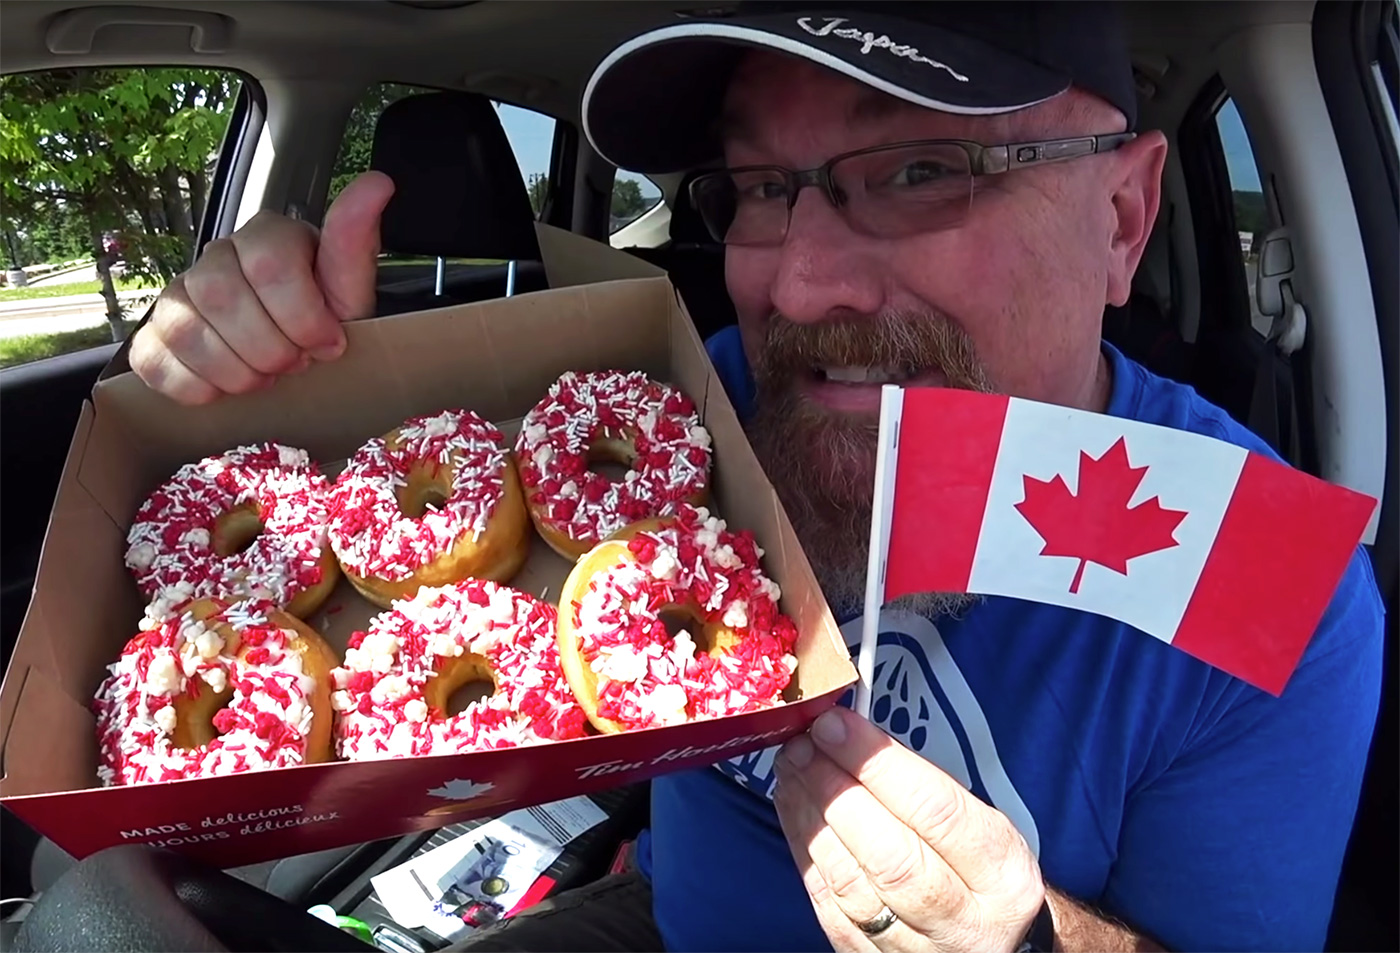 Canada Day 2019: YouTuber Ken Domik Rocking MBW!